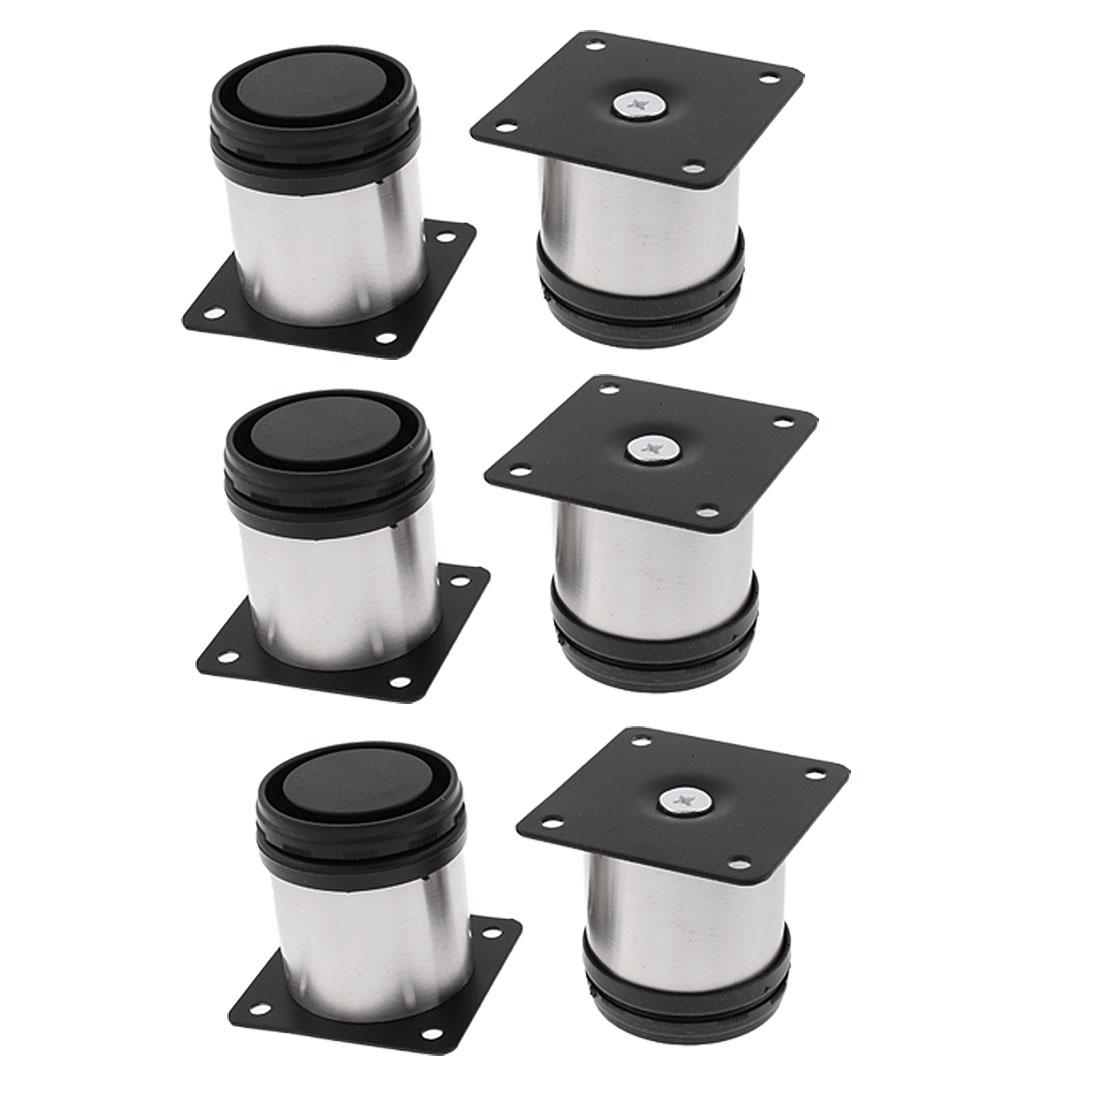 Furniture Cabinet Adjustable Plinth Stand Leg 50 x 60mm 6pcs